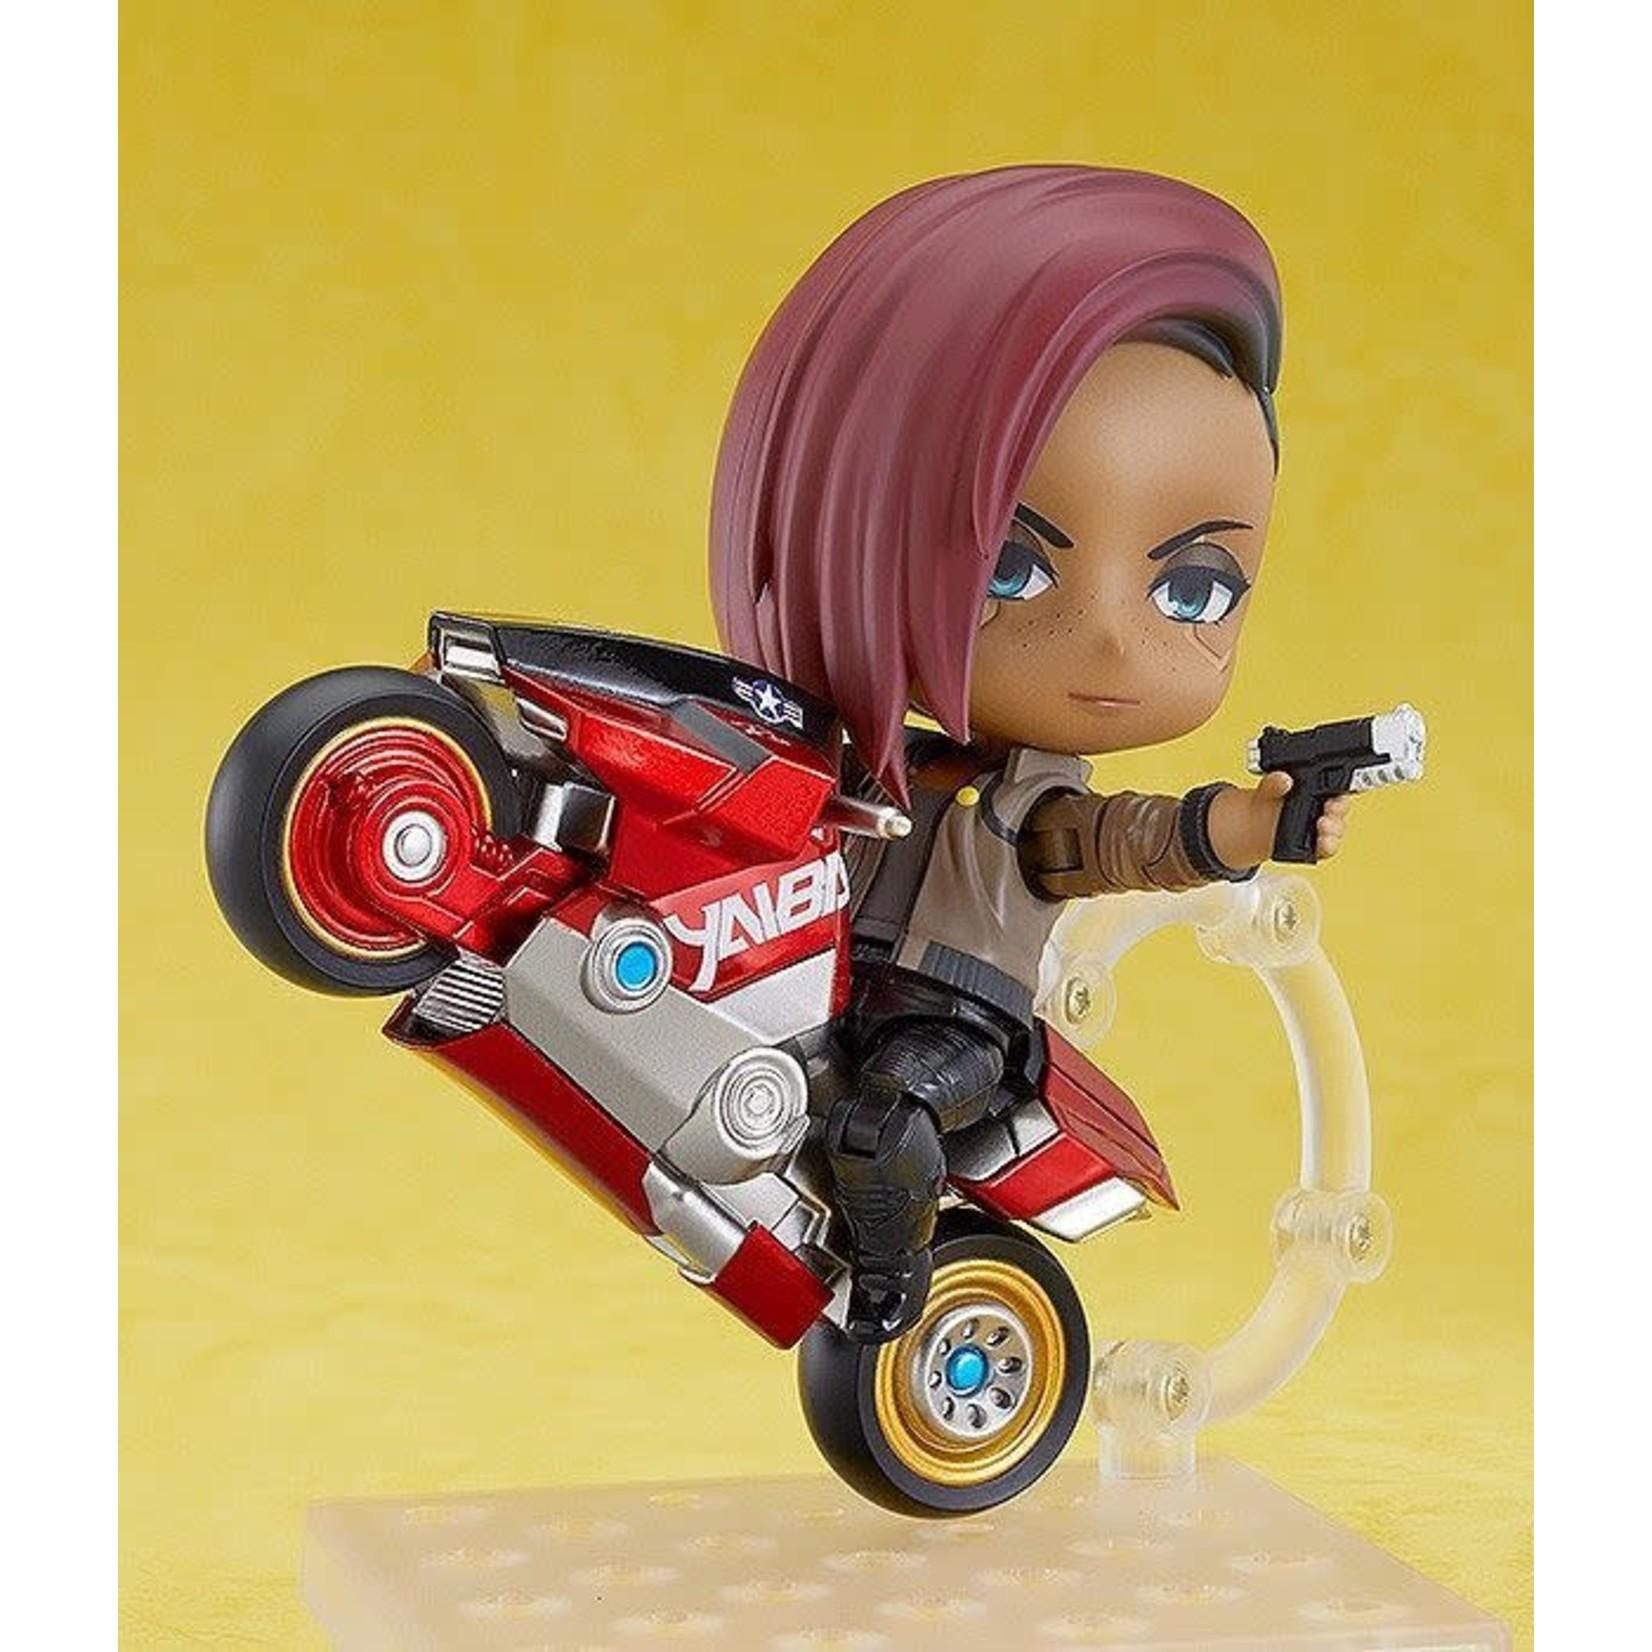 Goodsmile Company Nendoroid V: Female Ver. DX ( Cyberpunk 2077)